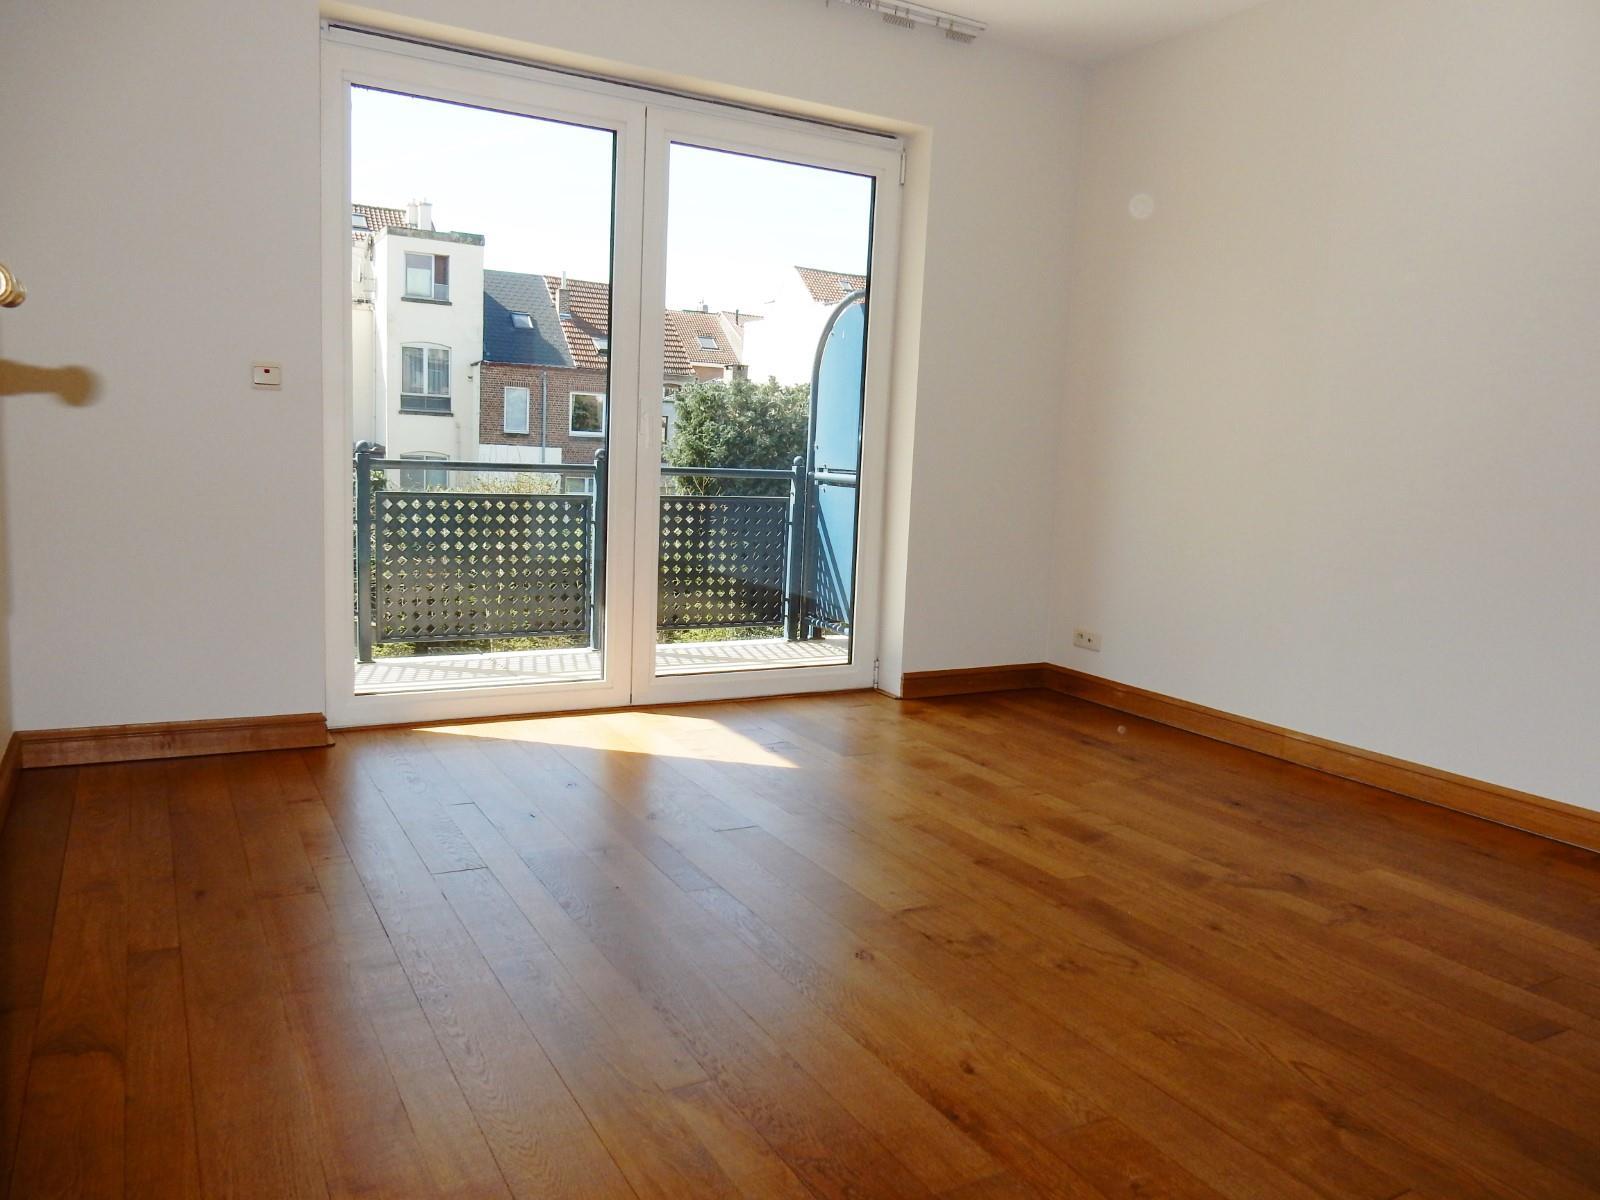 Exceptional apartment  - Woluwe-Saint-Pierre - #3201024-3